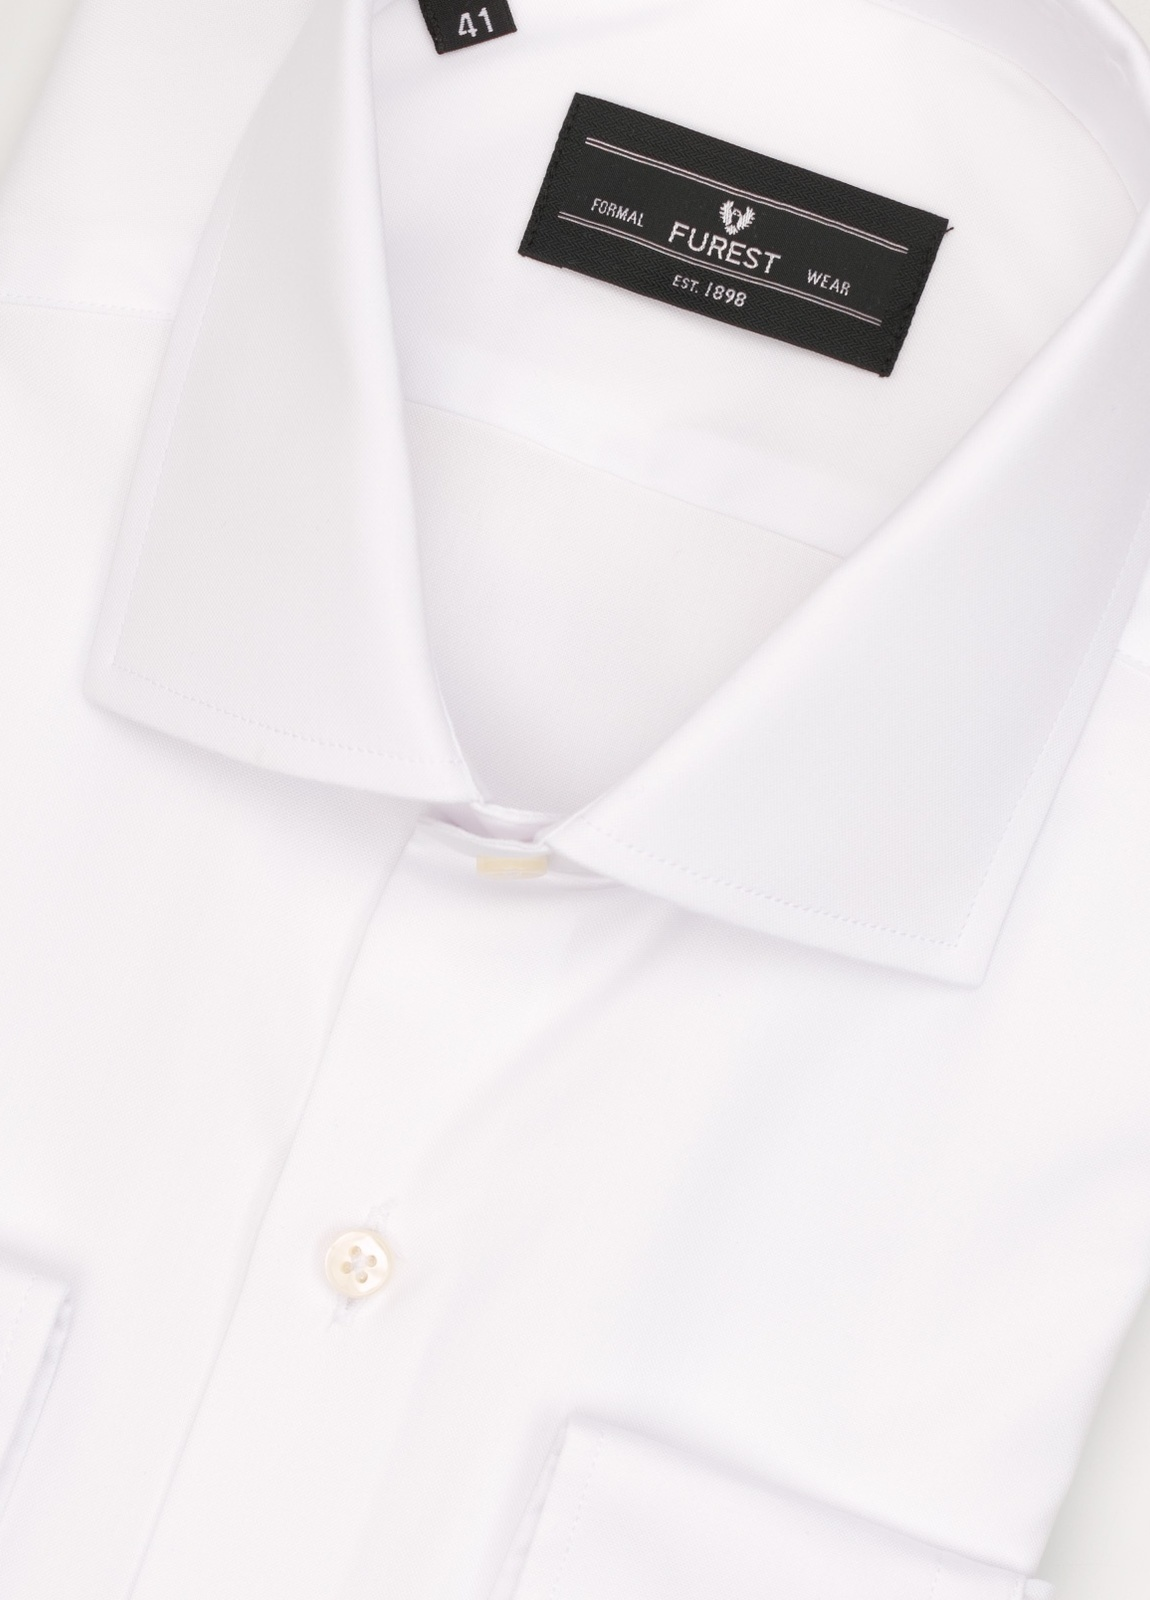 Camisa Formal Wear REGULAR FIT cuello italiano modelo TAILORED NAPOLI tejido color blanco, 100% Algodón. - Ítem2